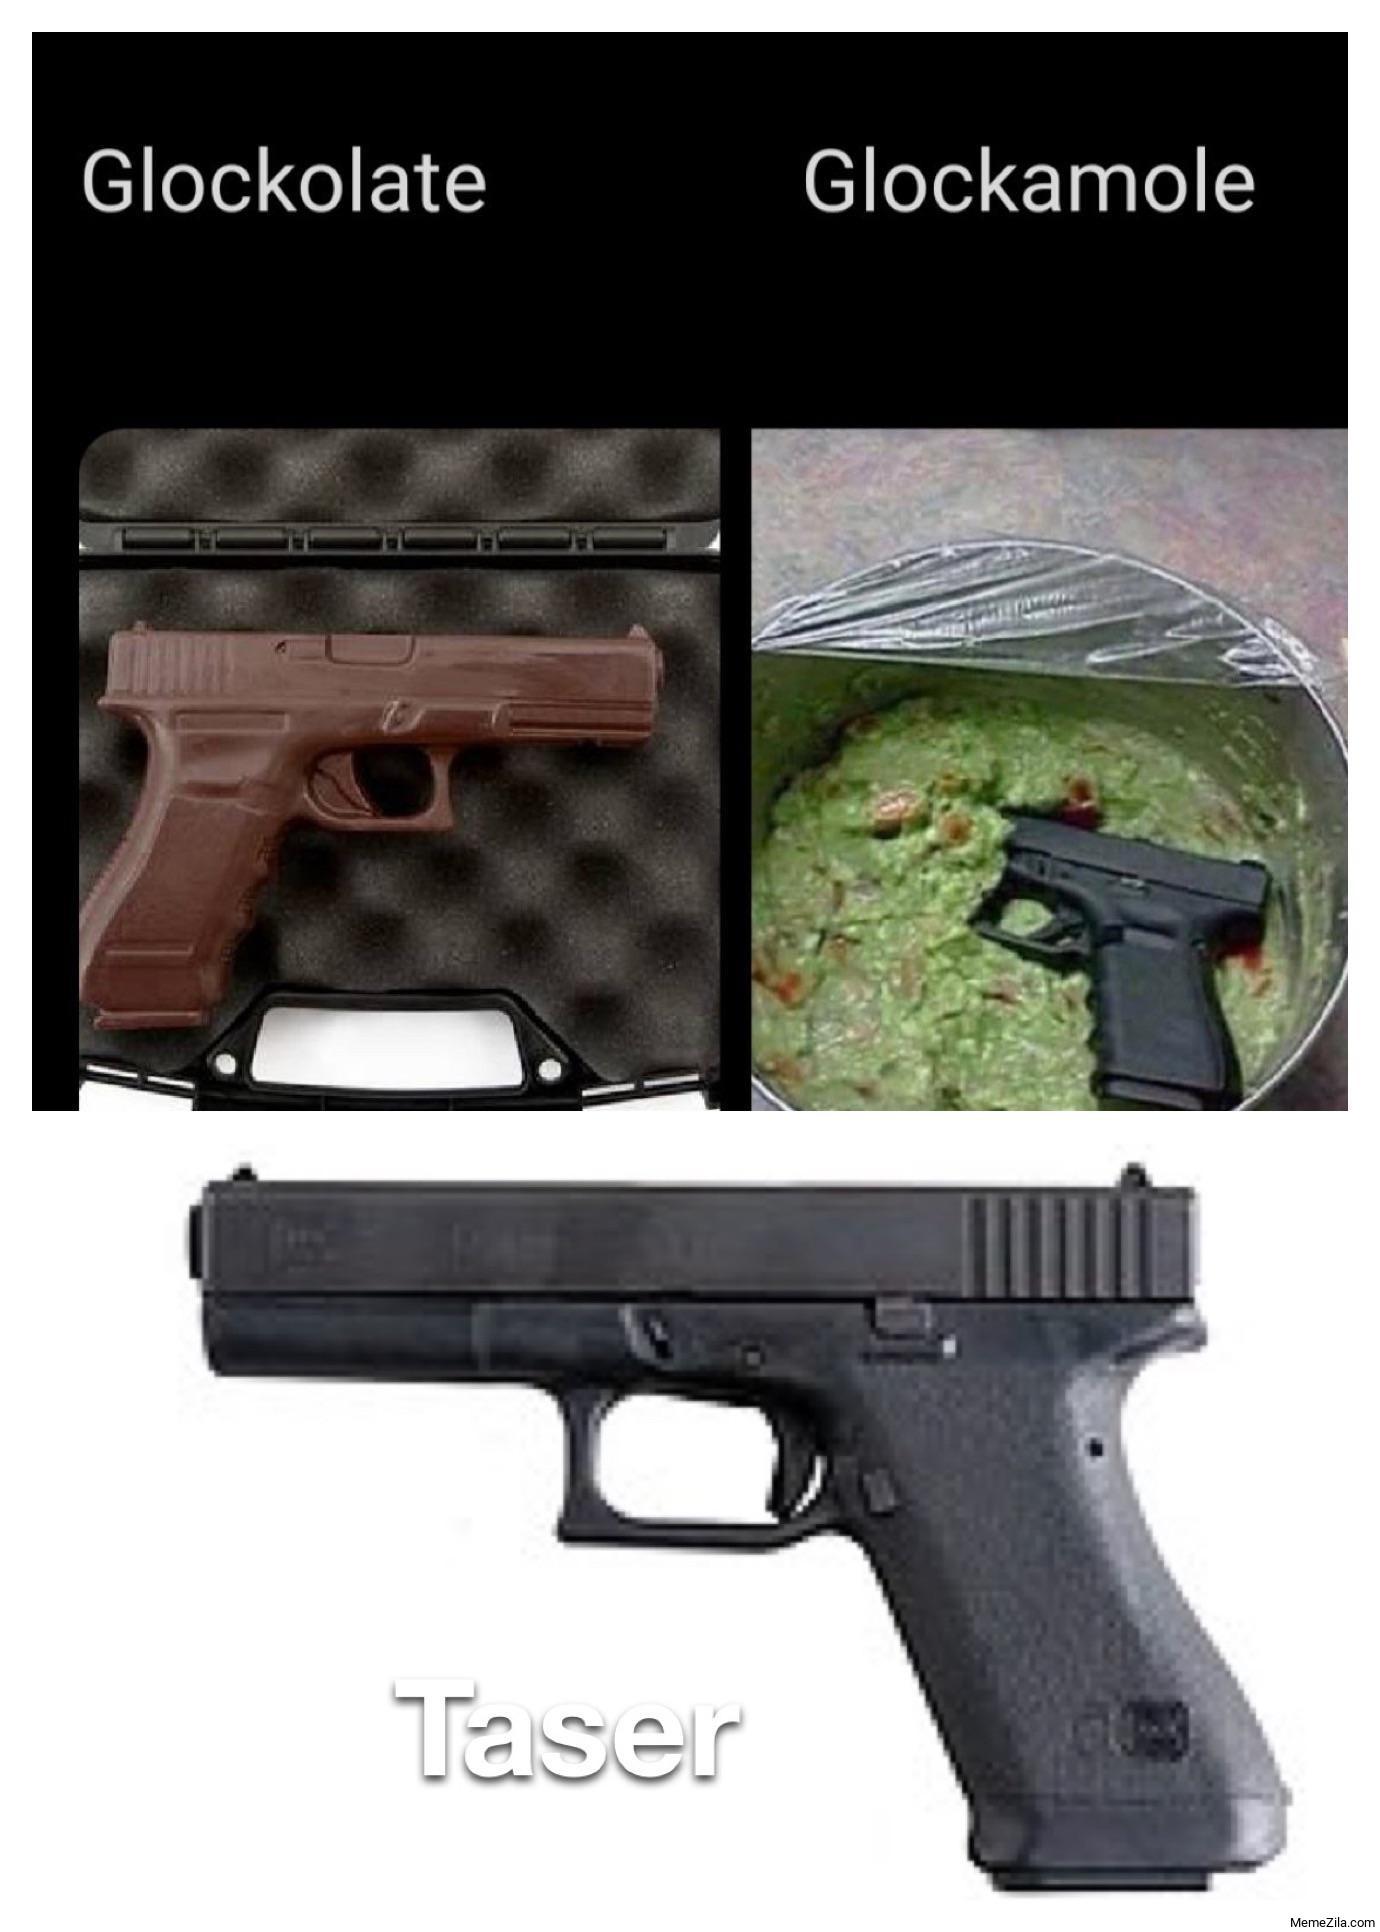 Glockolate Glockamole Taser meme